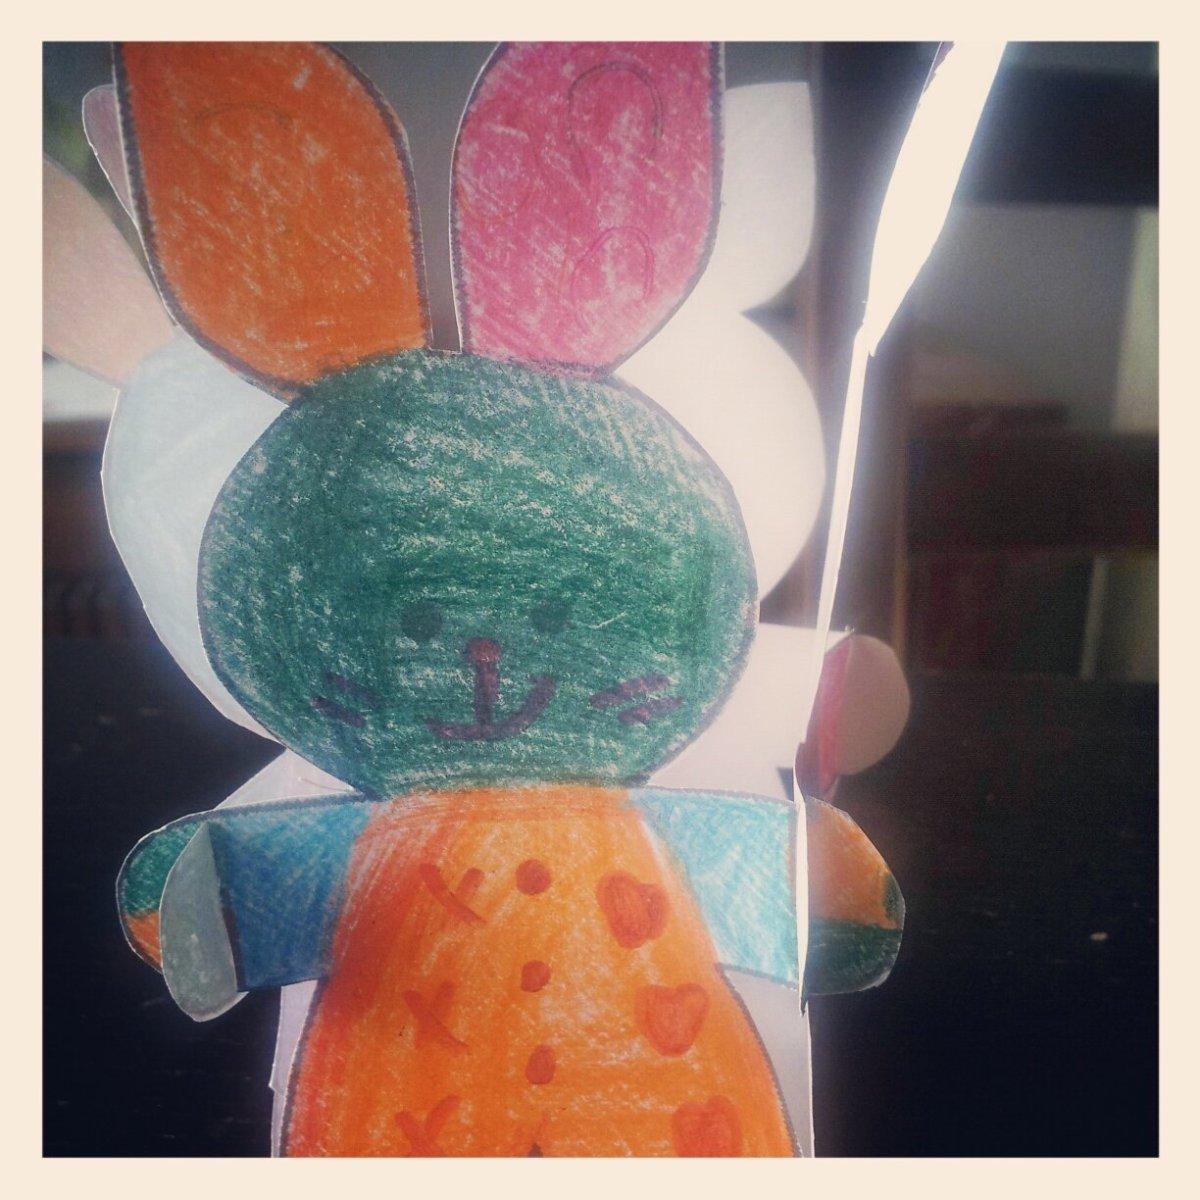 Paniers lapin de Pâques {tuto DIY}